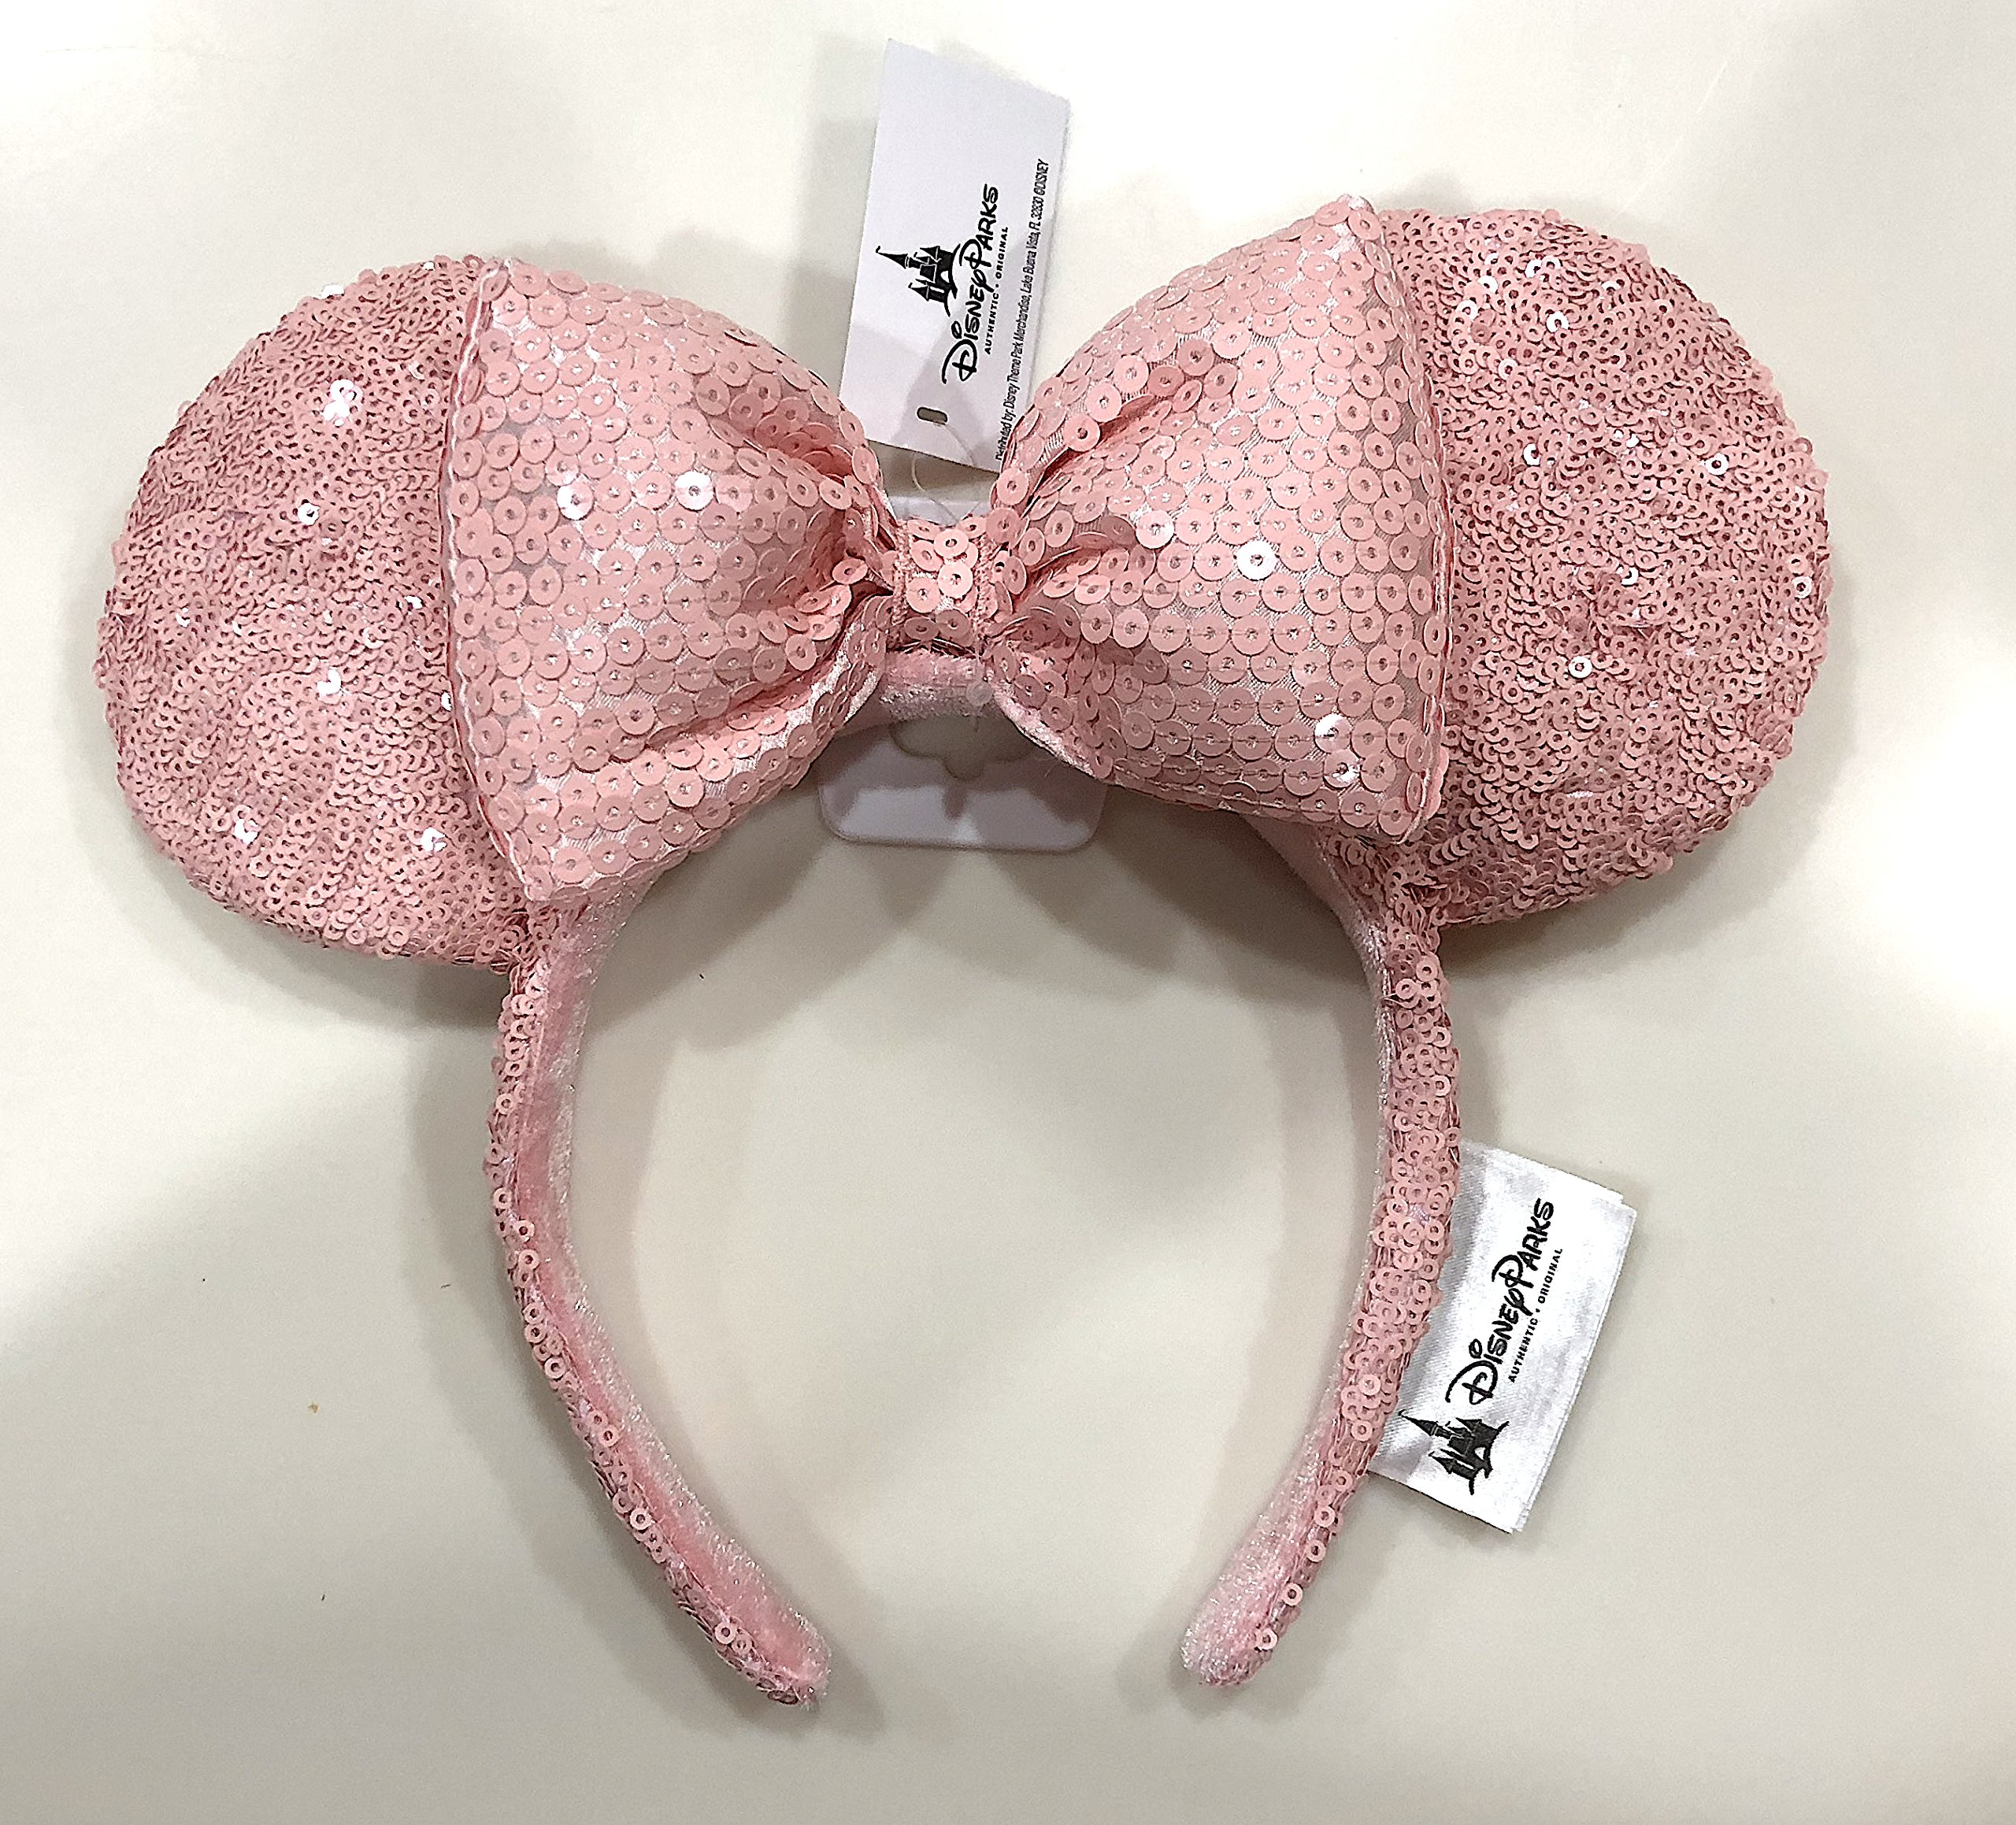 Disney Parks Millennial Pink Minnie Mouse Ear Sequined Headband